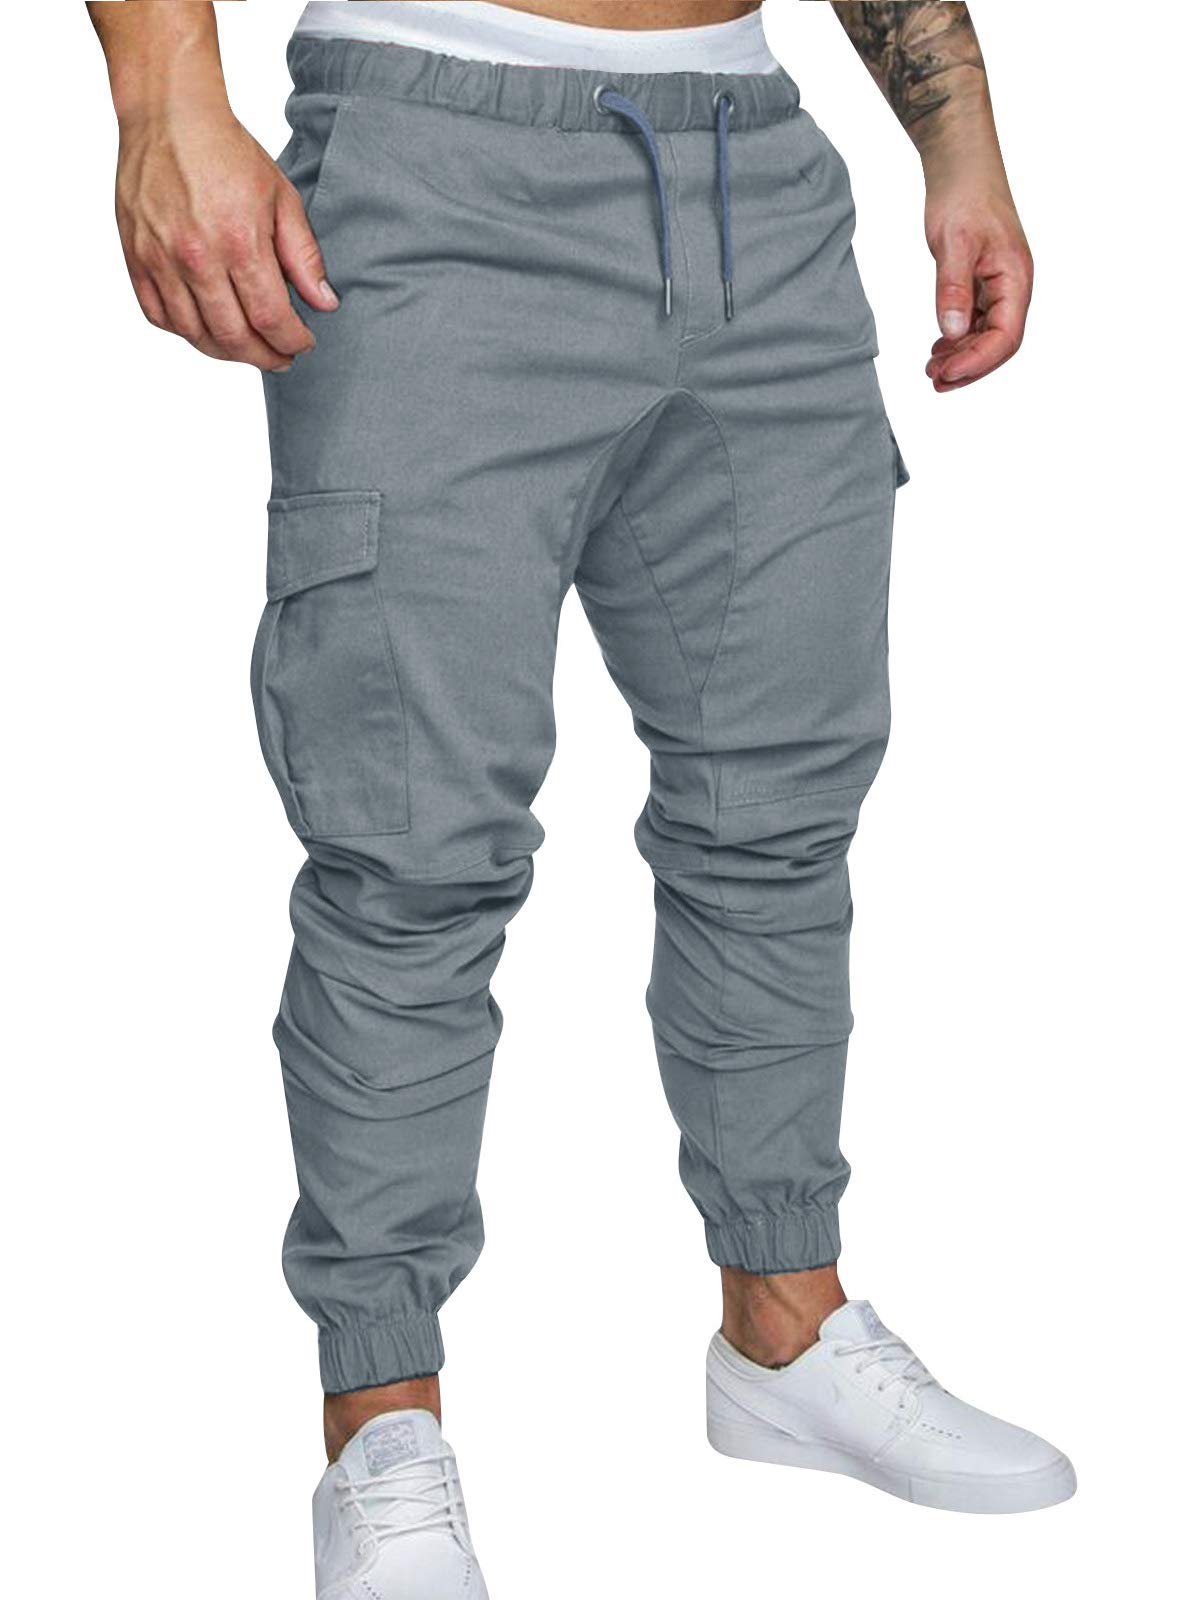 Cindeyar Men's Cargo Pants Slim Fit Casual Jogger Pant Chino Trousers Sweatpants(Gray,X-Large)